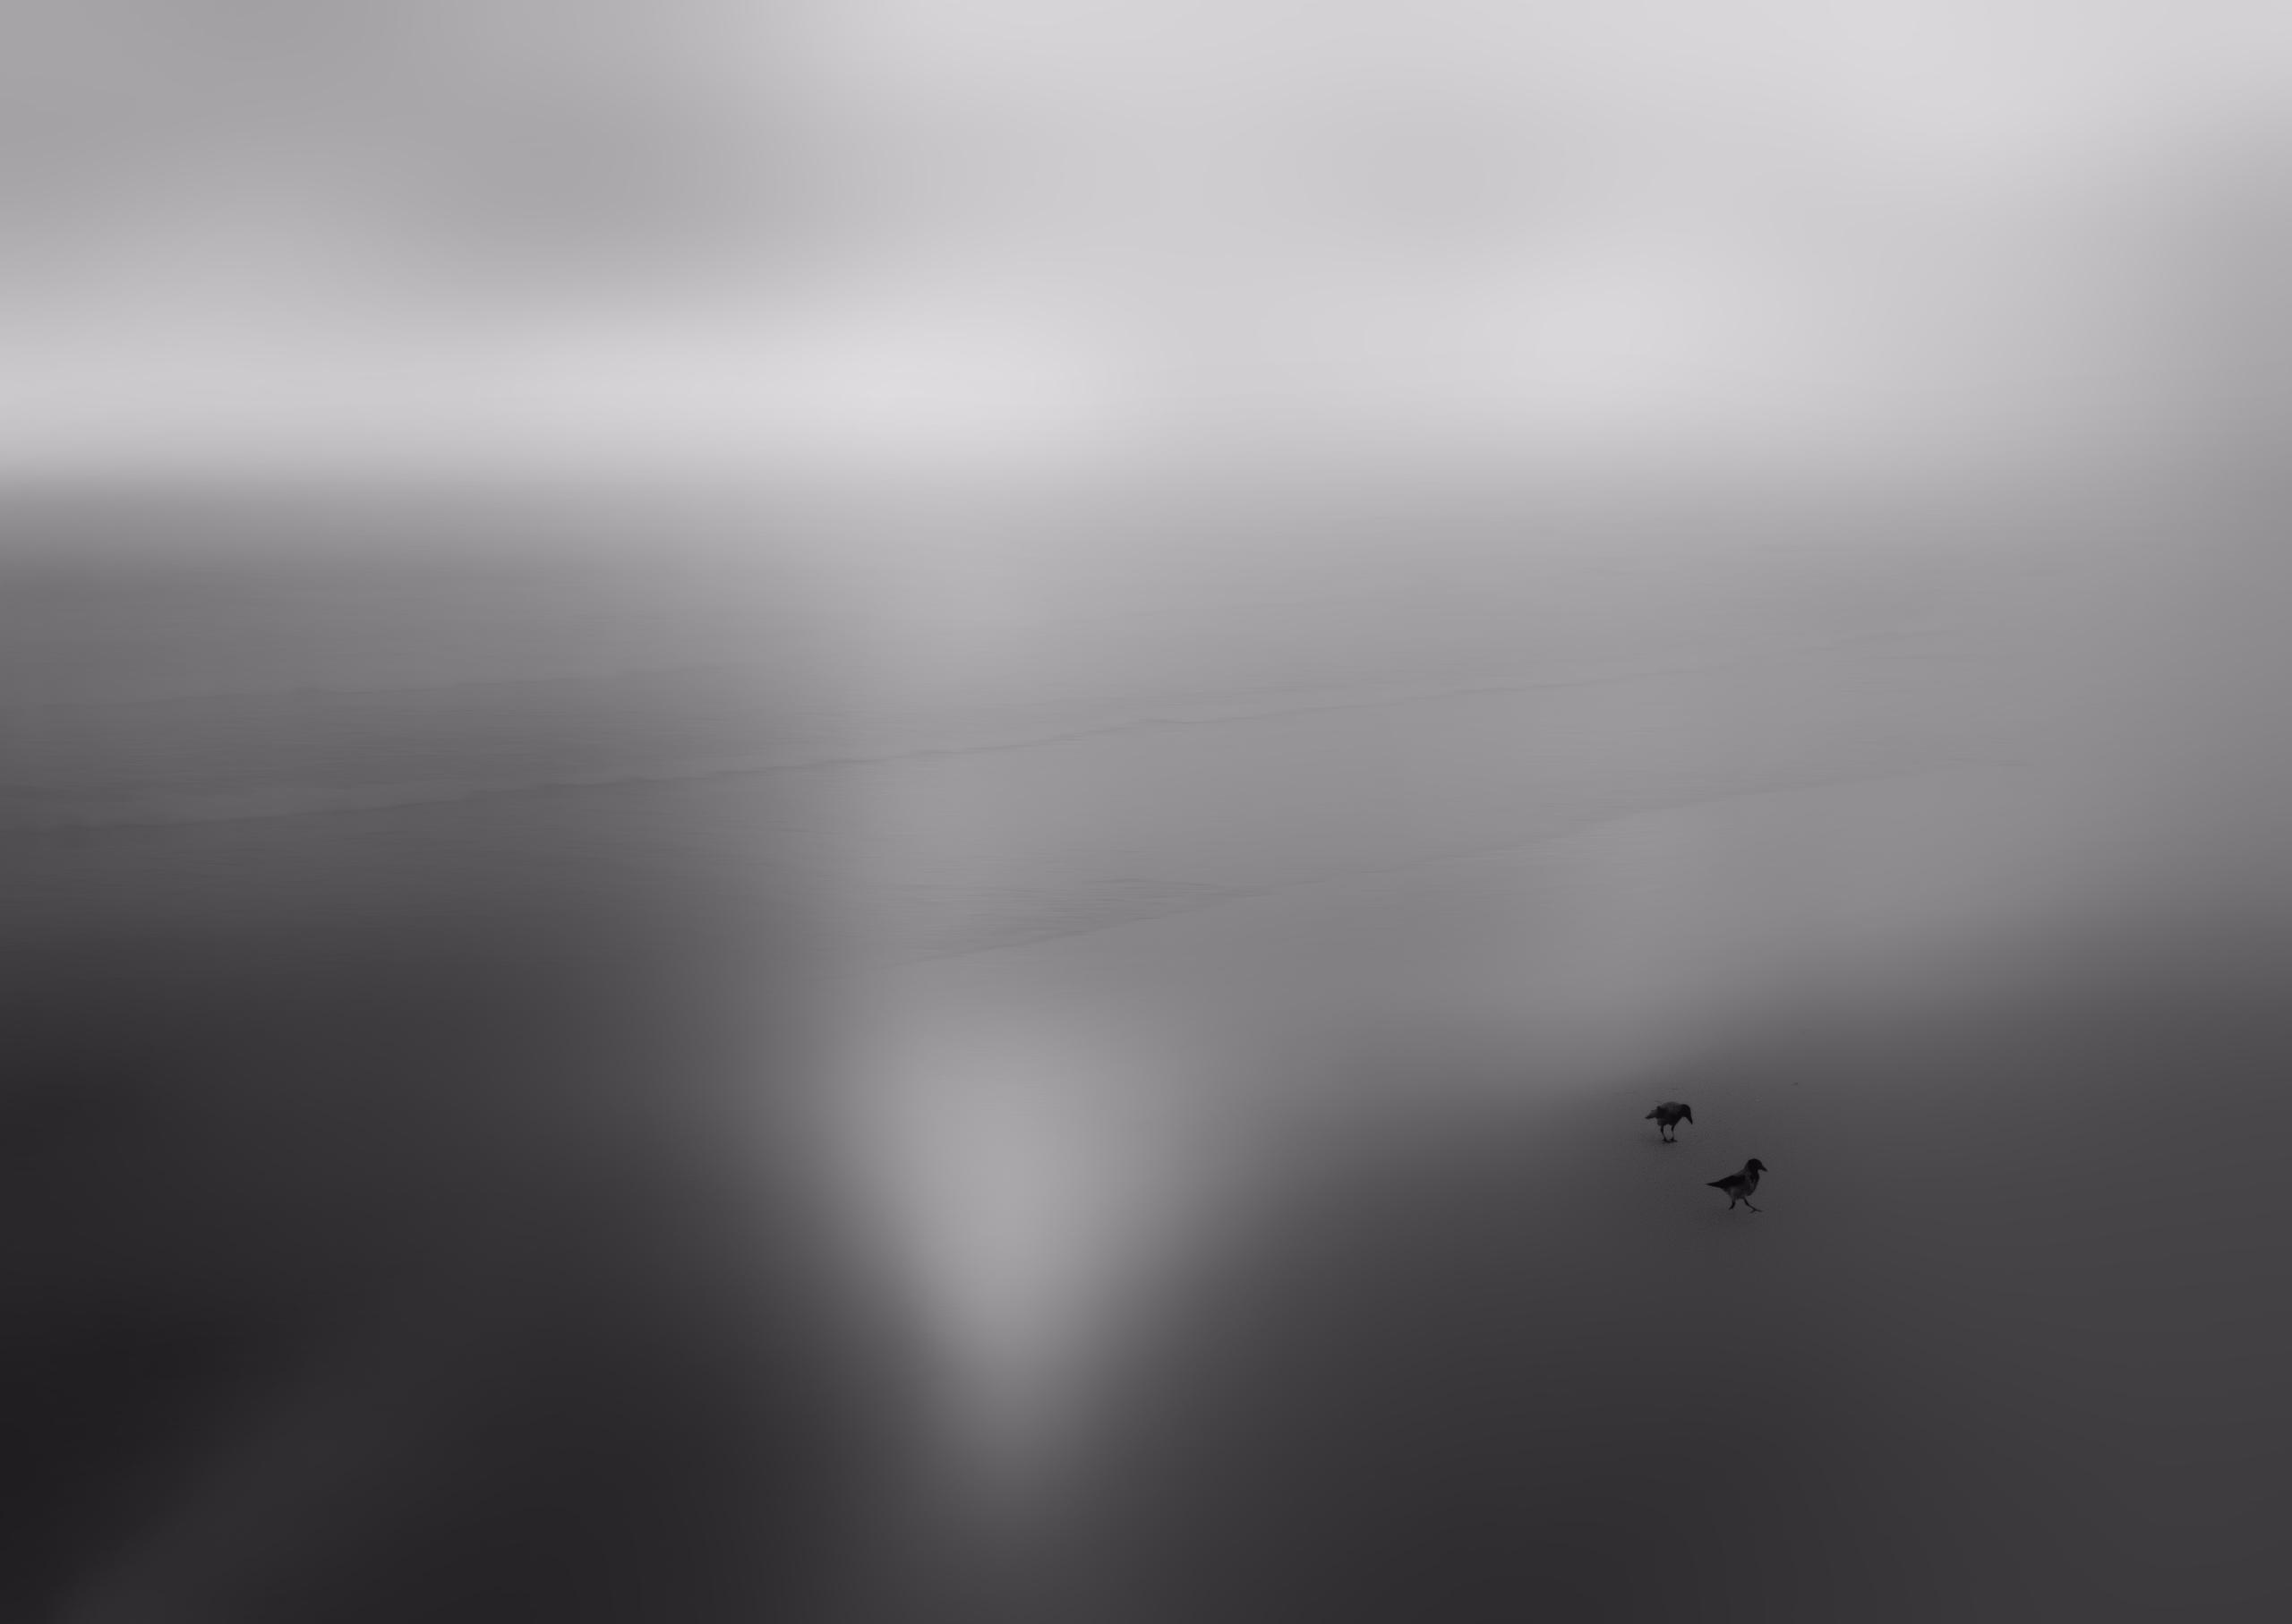 Melancholy - photography, mood, bw - elhanans | ello